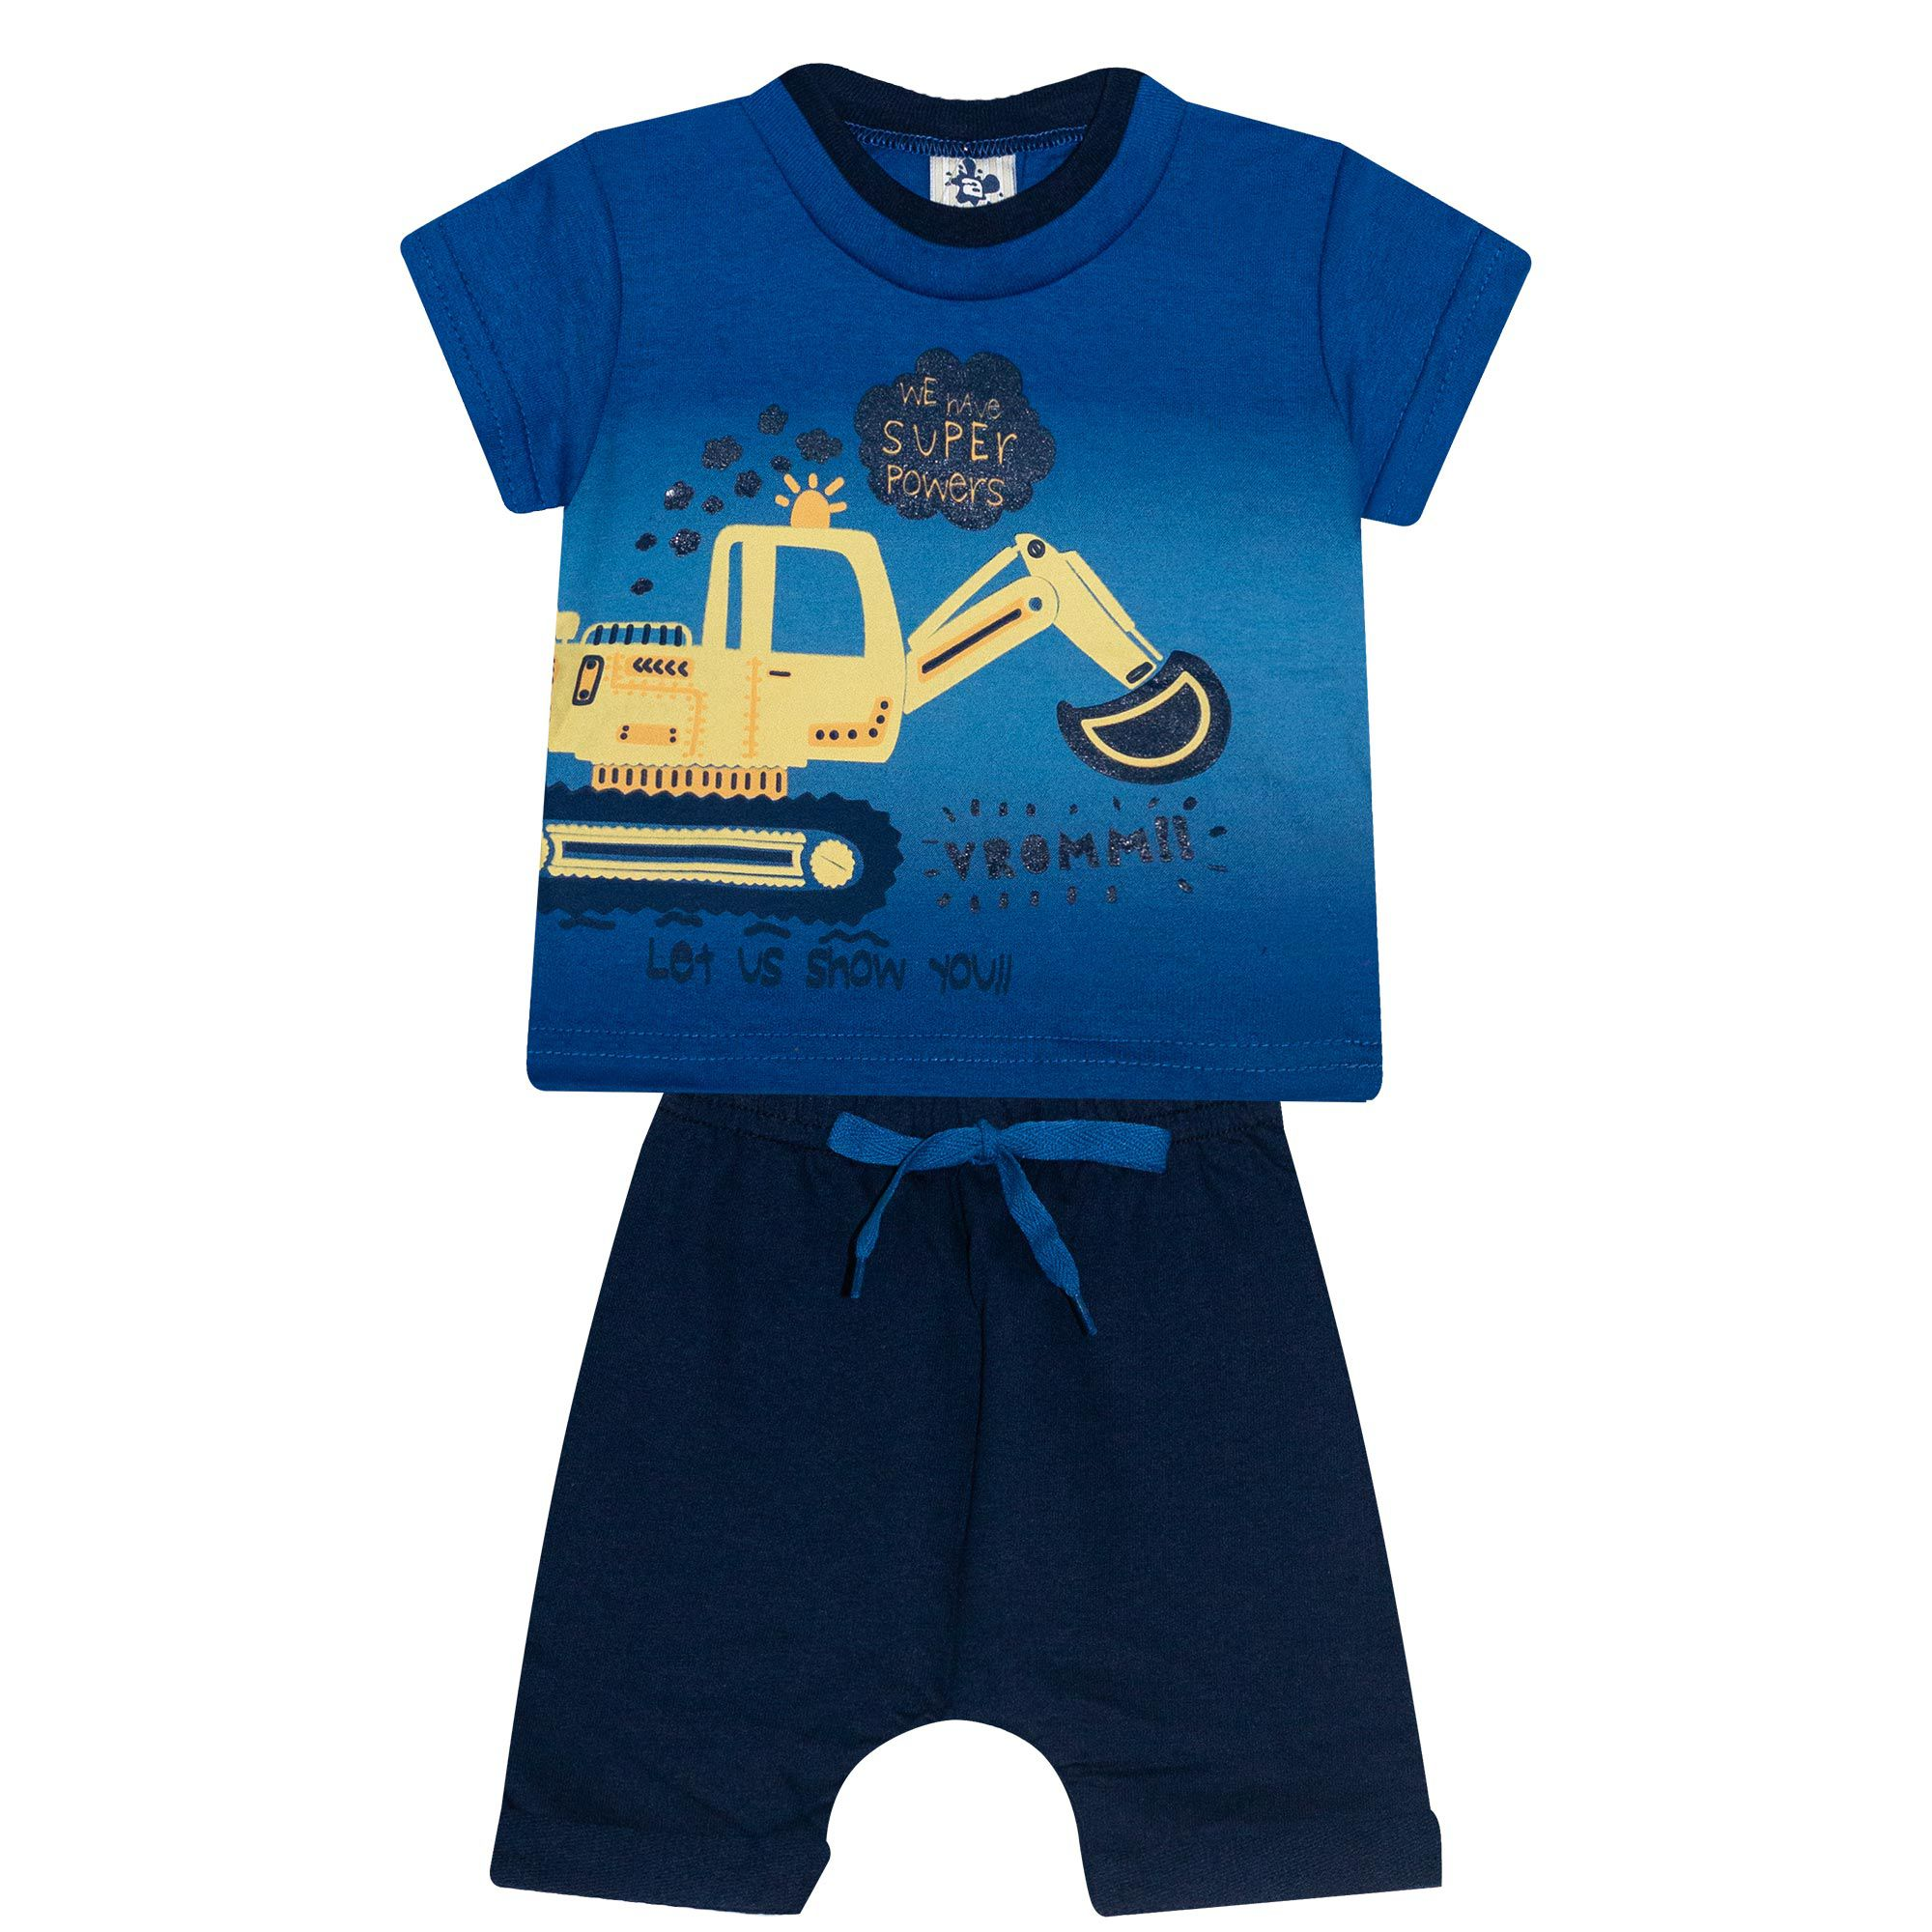 Conjunto Infantil Masculino - Ref 4694 - Azul - Andritex